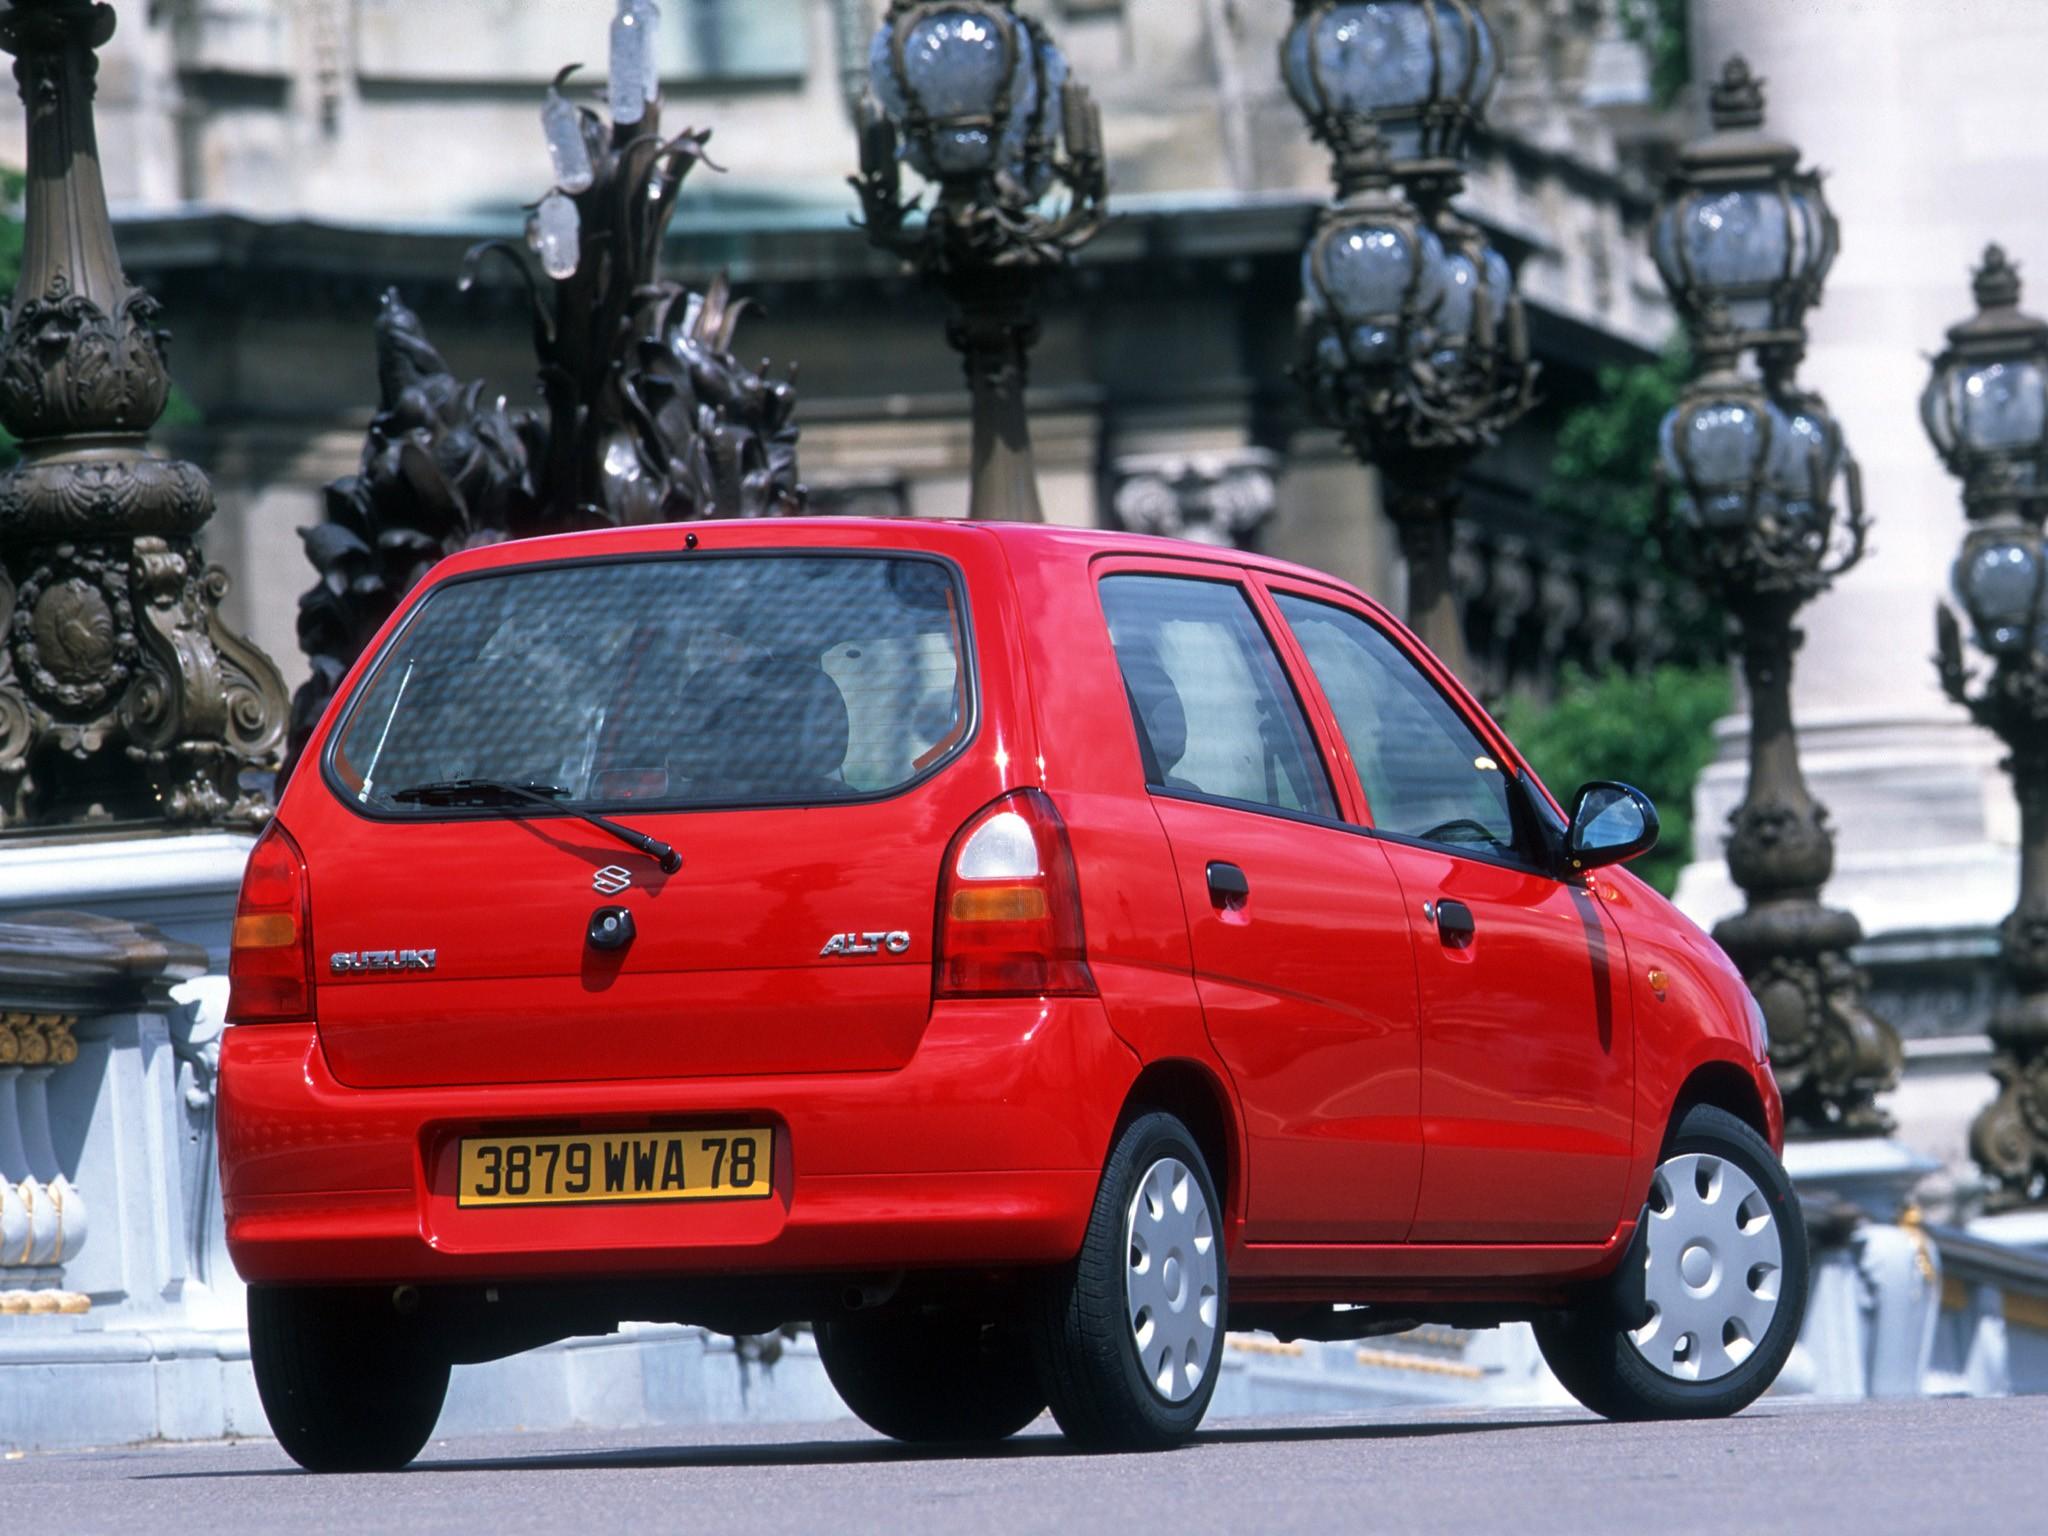 Suzuki Ignis Gl Max Boot Space in addition Facebook Icon furthermore Suzuki Swift Sport Images Thai Motor Expo Fro E further Hqdefault as well Maruti Suzuki Baleno. on maruti suzuki